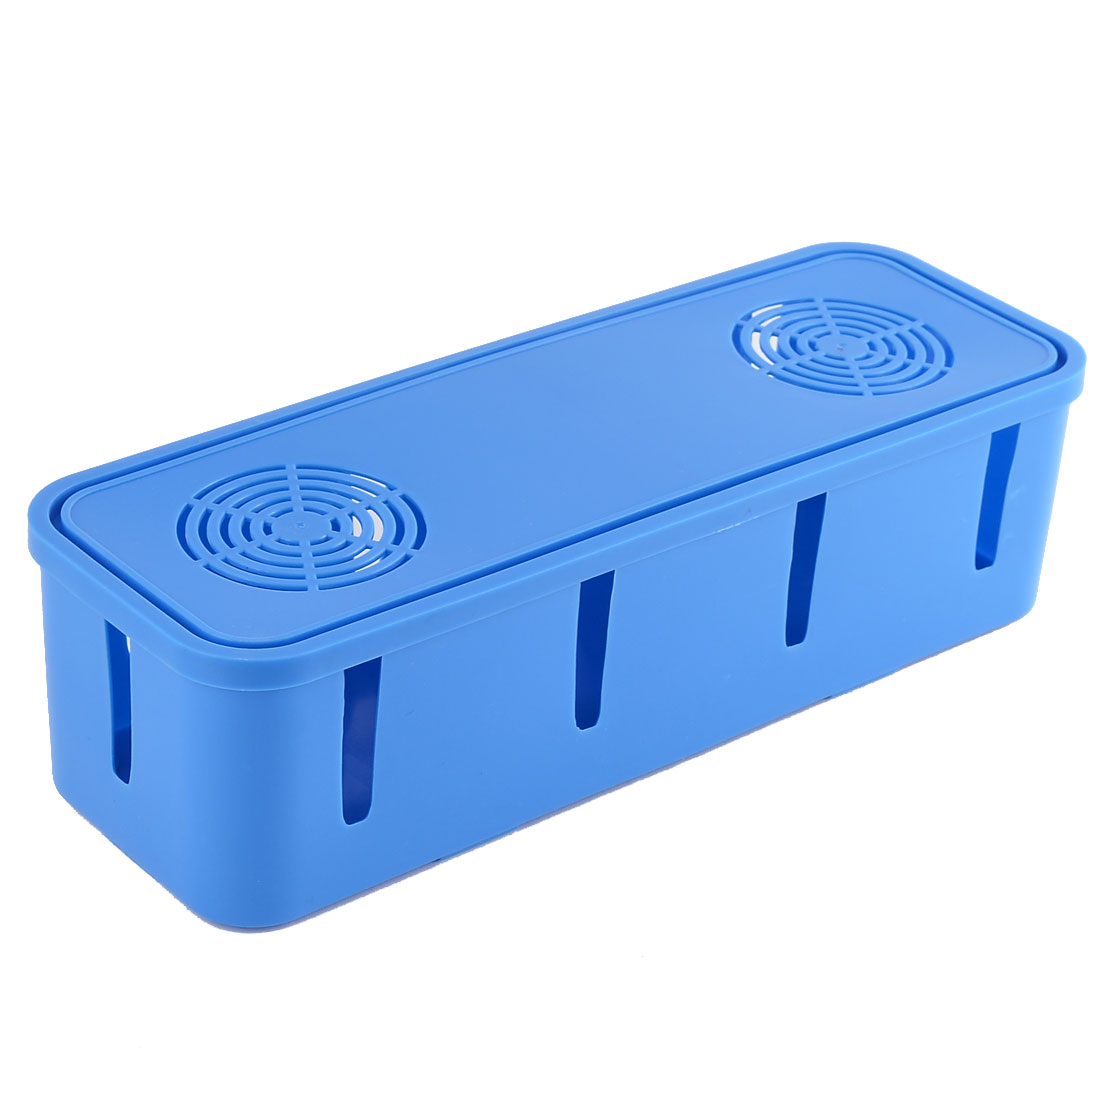 Plastic 10 Holes Design Security Power Cord Socket Storage Case Box Blue